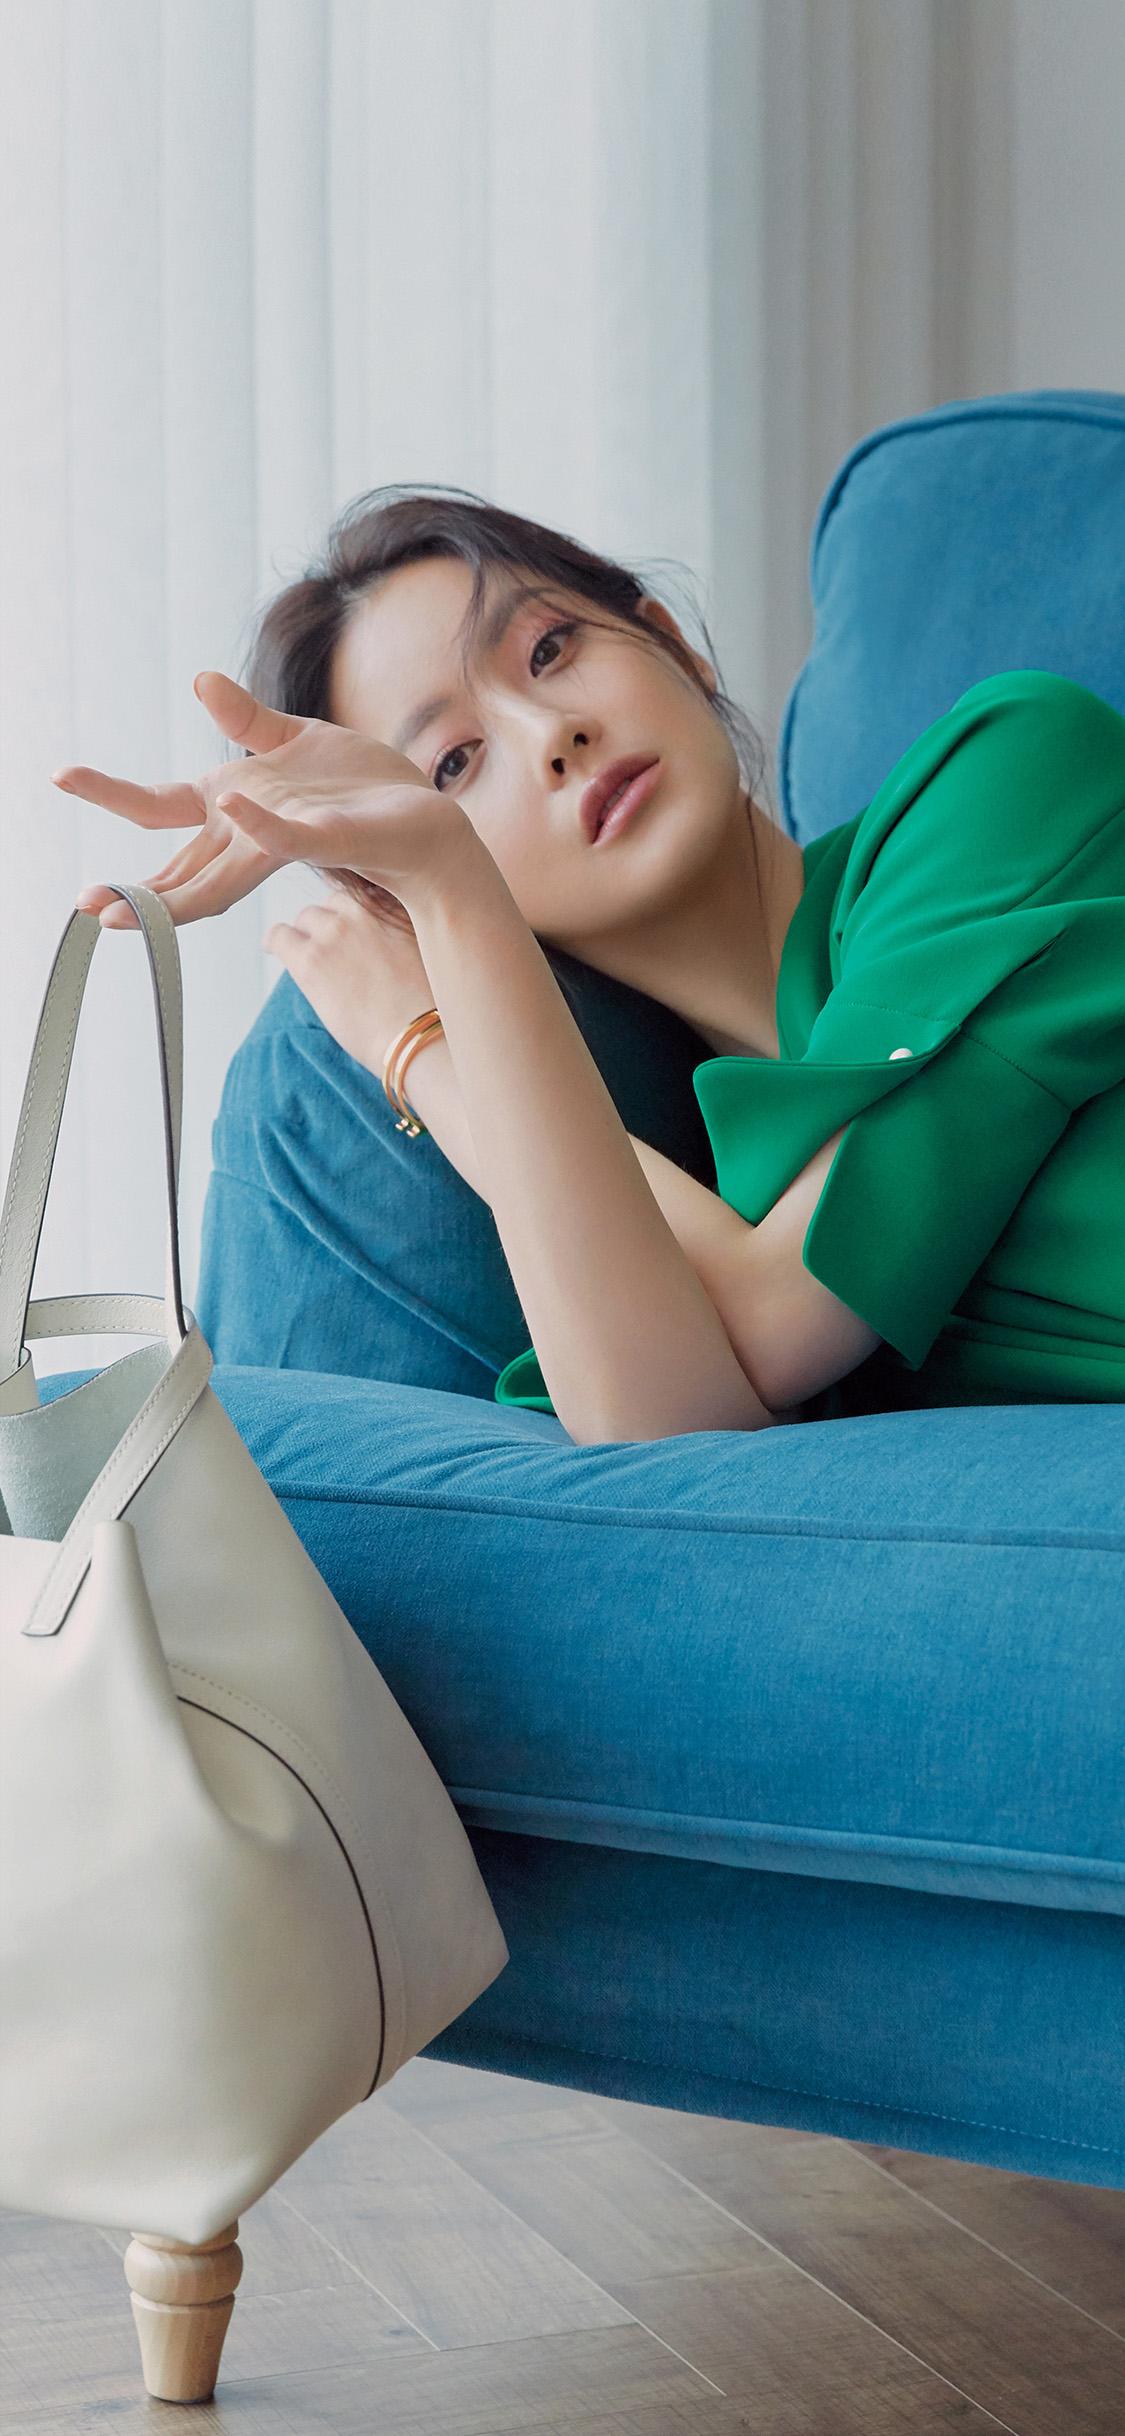 iPhonexpapers.com-Apple-iPhone-wallpaper-hp87-asian-girl-green-bag-ad